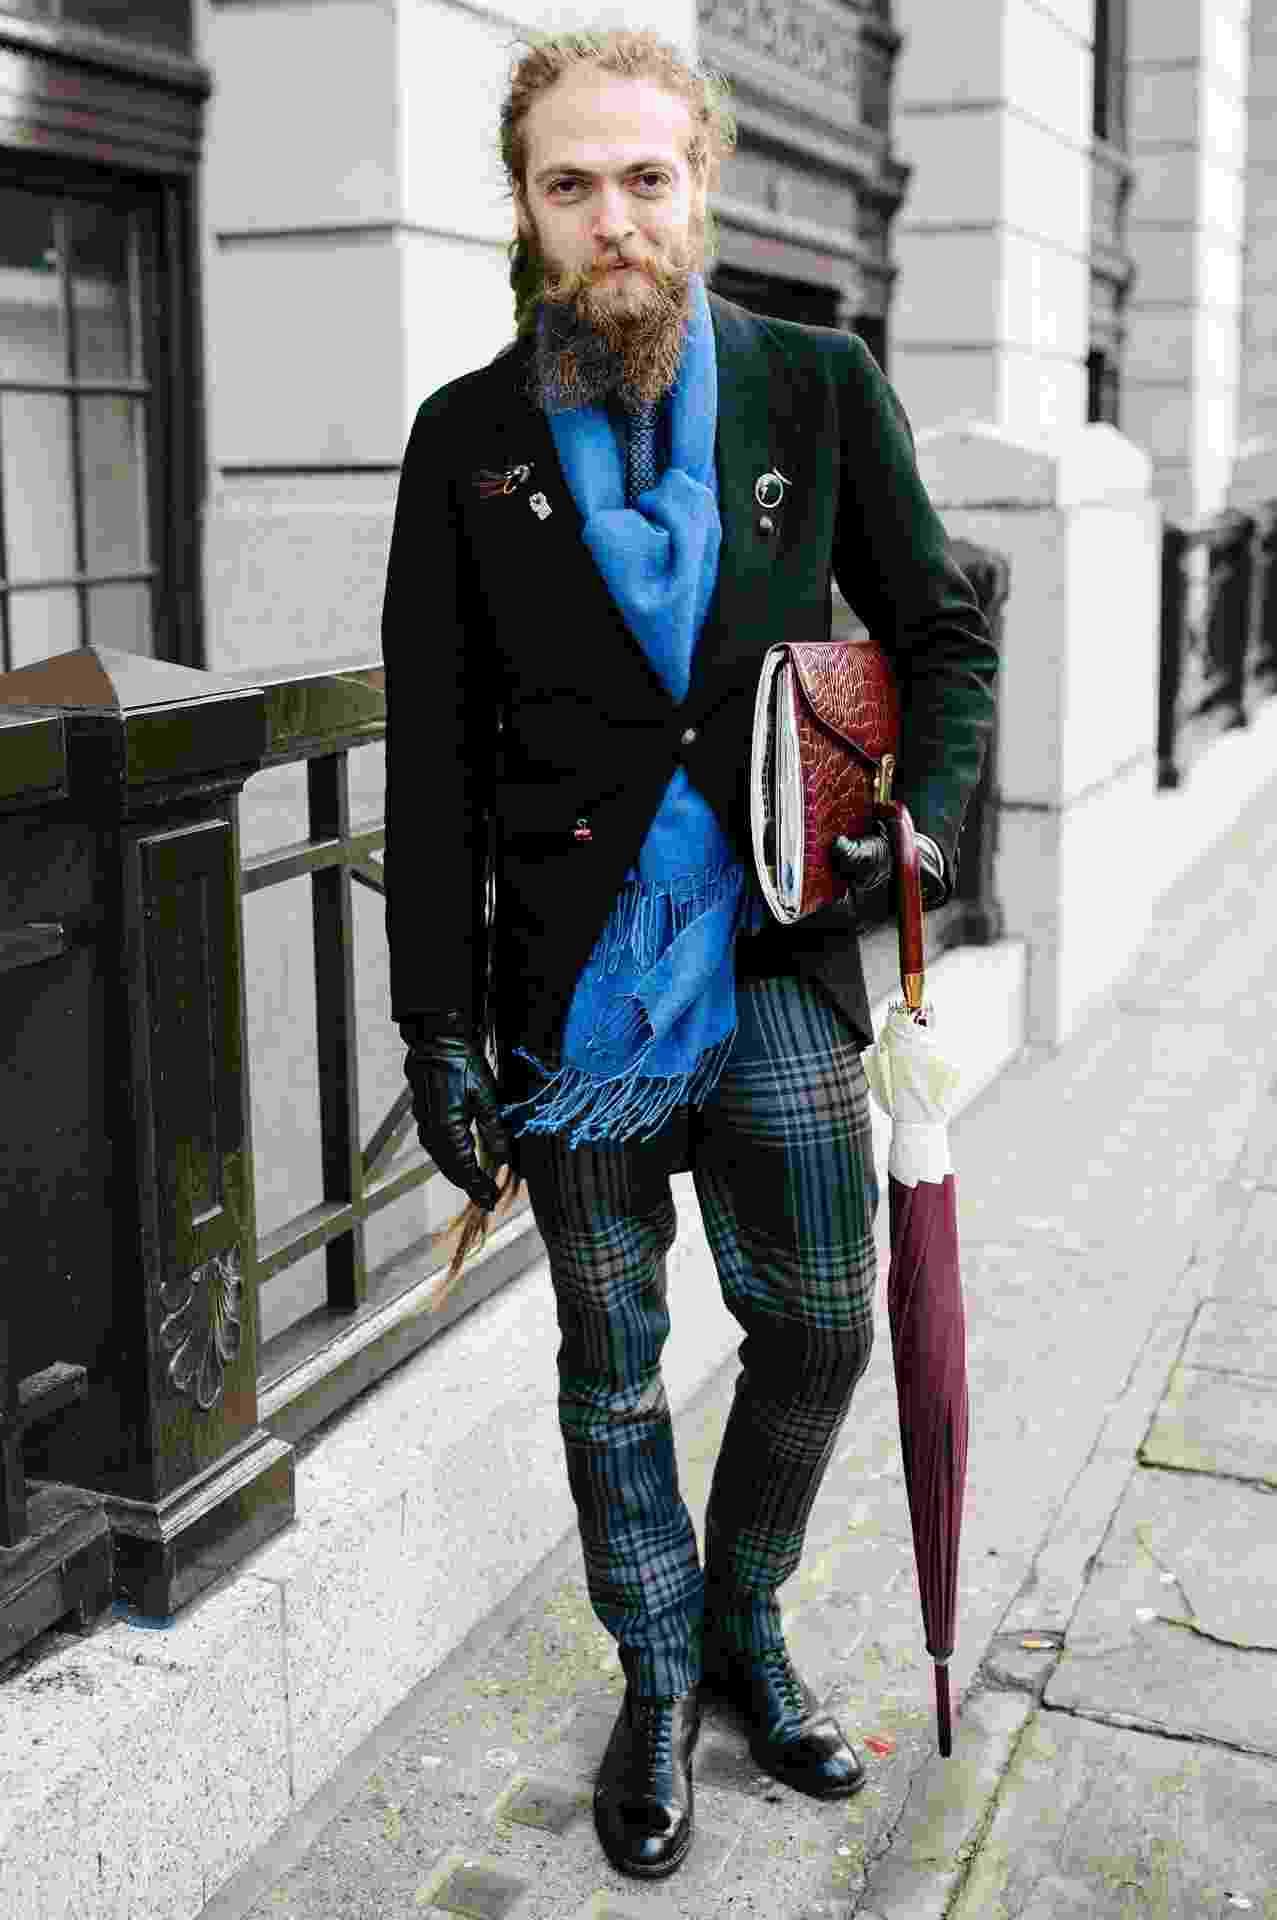 O assessor de imprensa Daniel posa com look total de Florin Dobre durante a temporada Inverno 2014 da London Collections: Men, semana de moda masculina de Londres - Getty Images